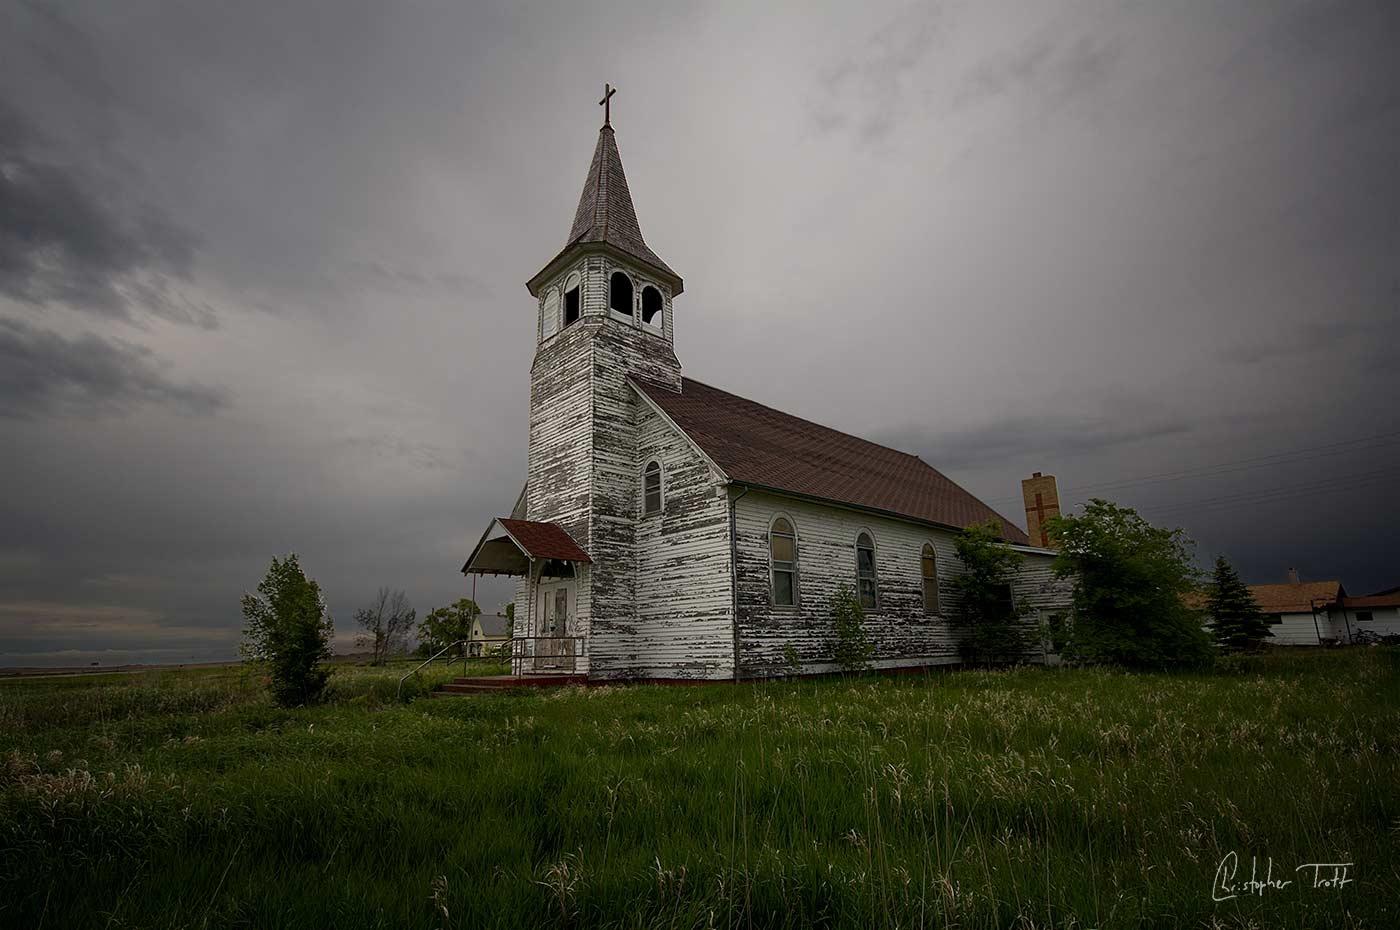 The Church at Balfour